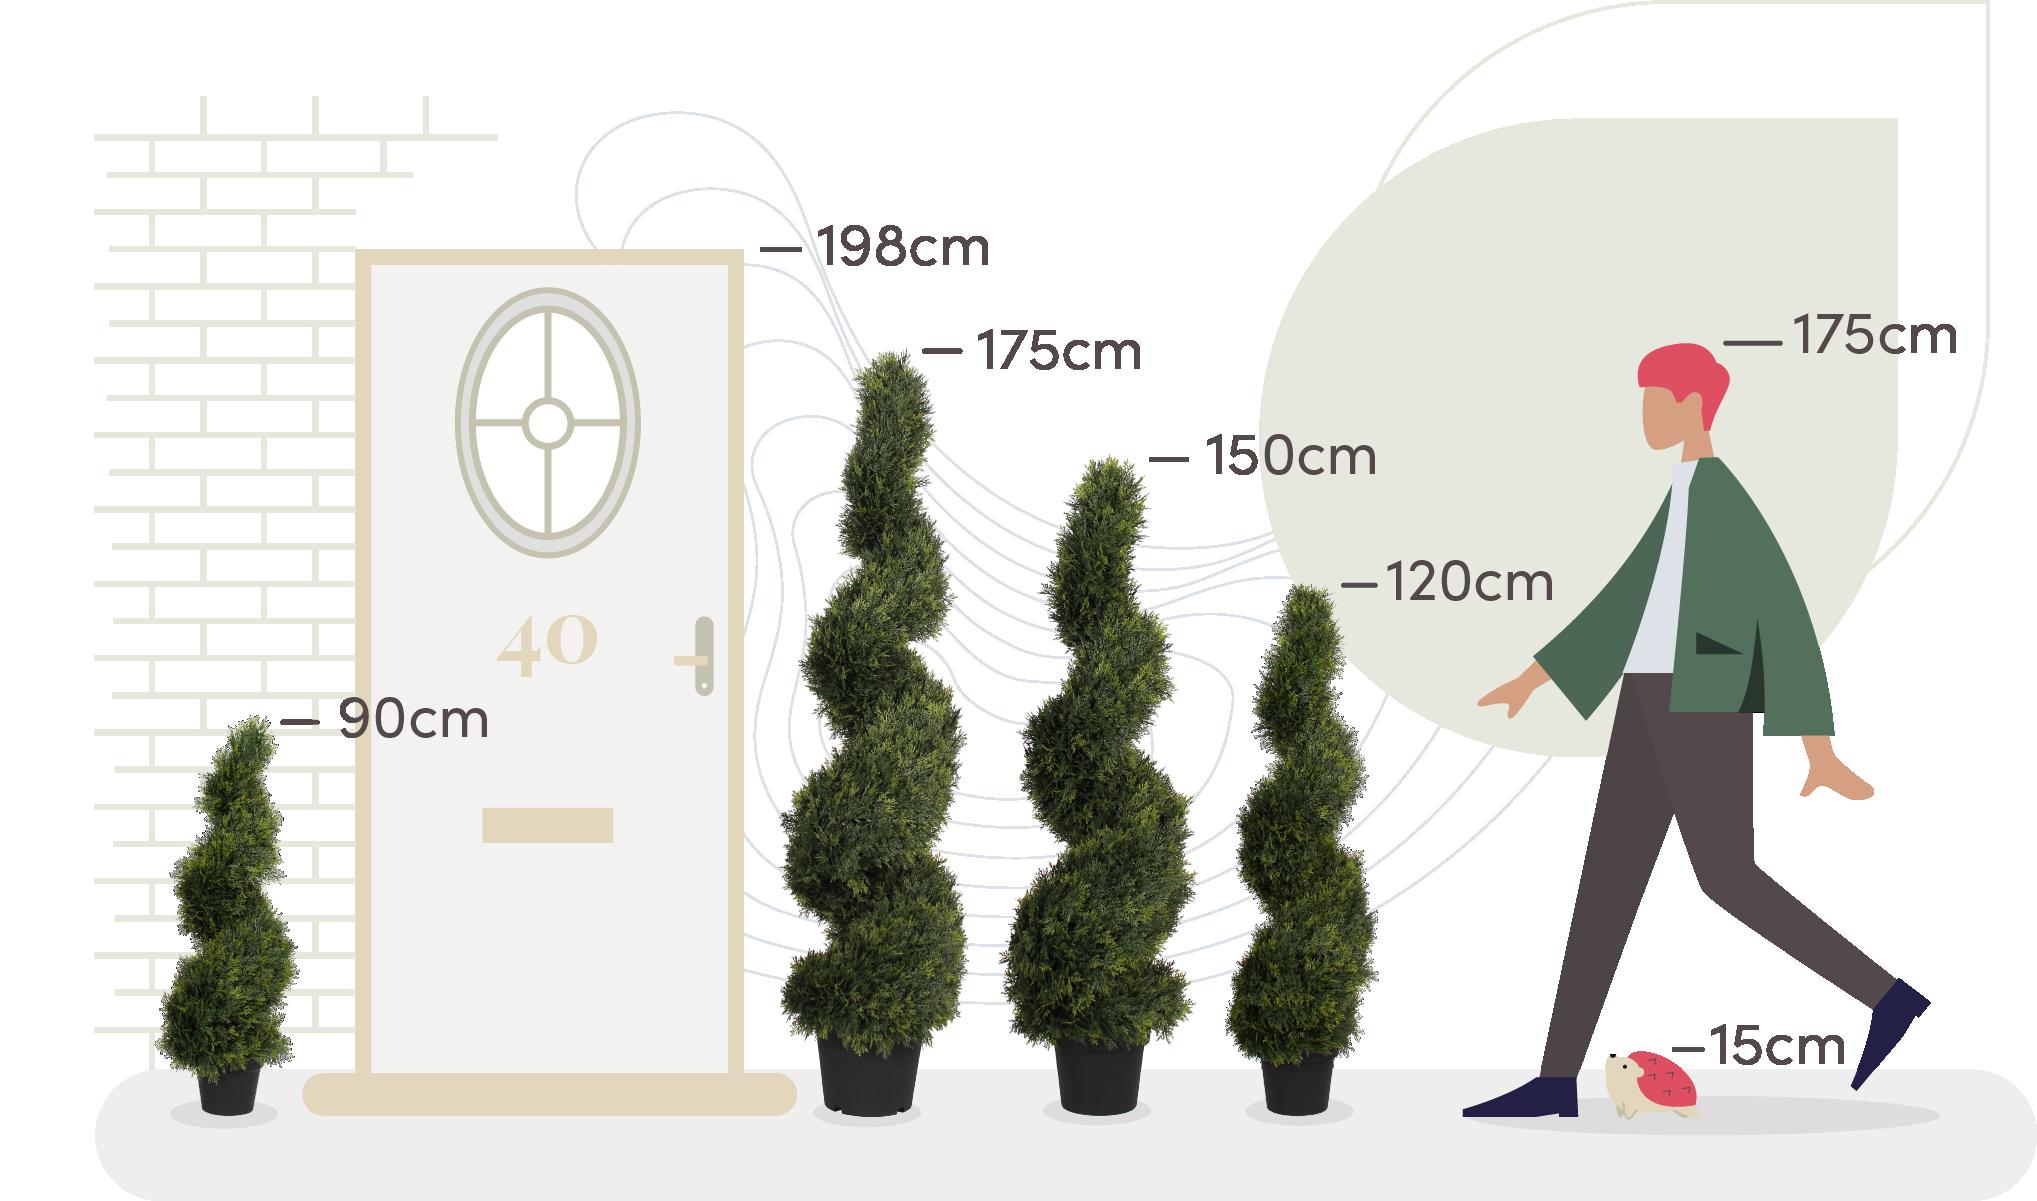 artificial cedar spiral size comparison